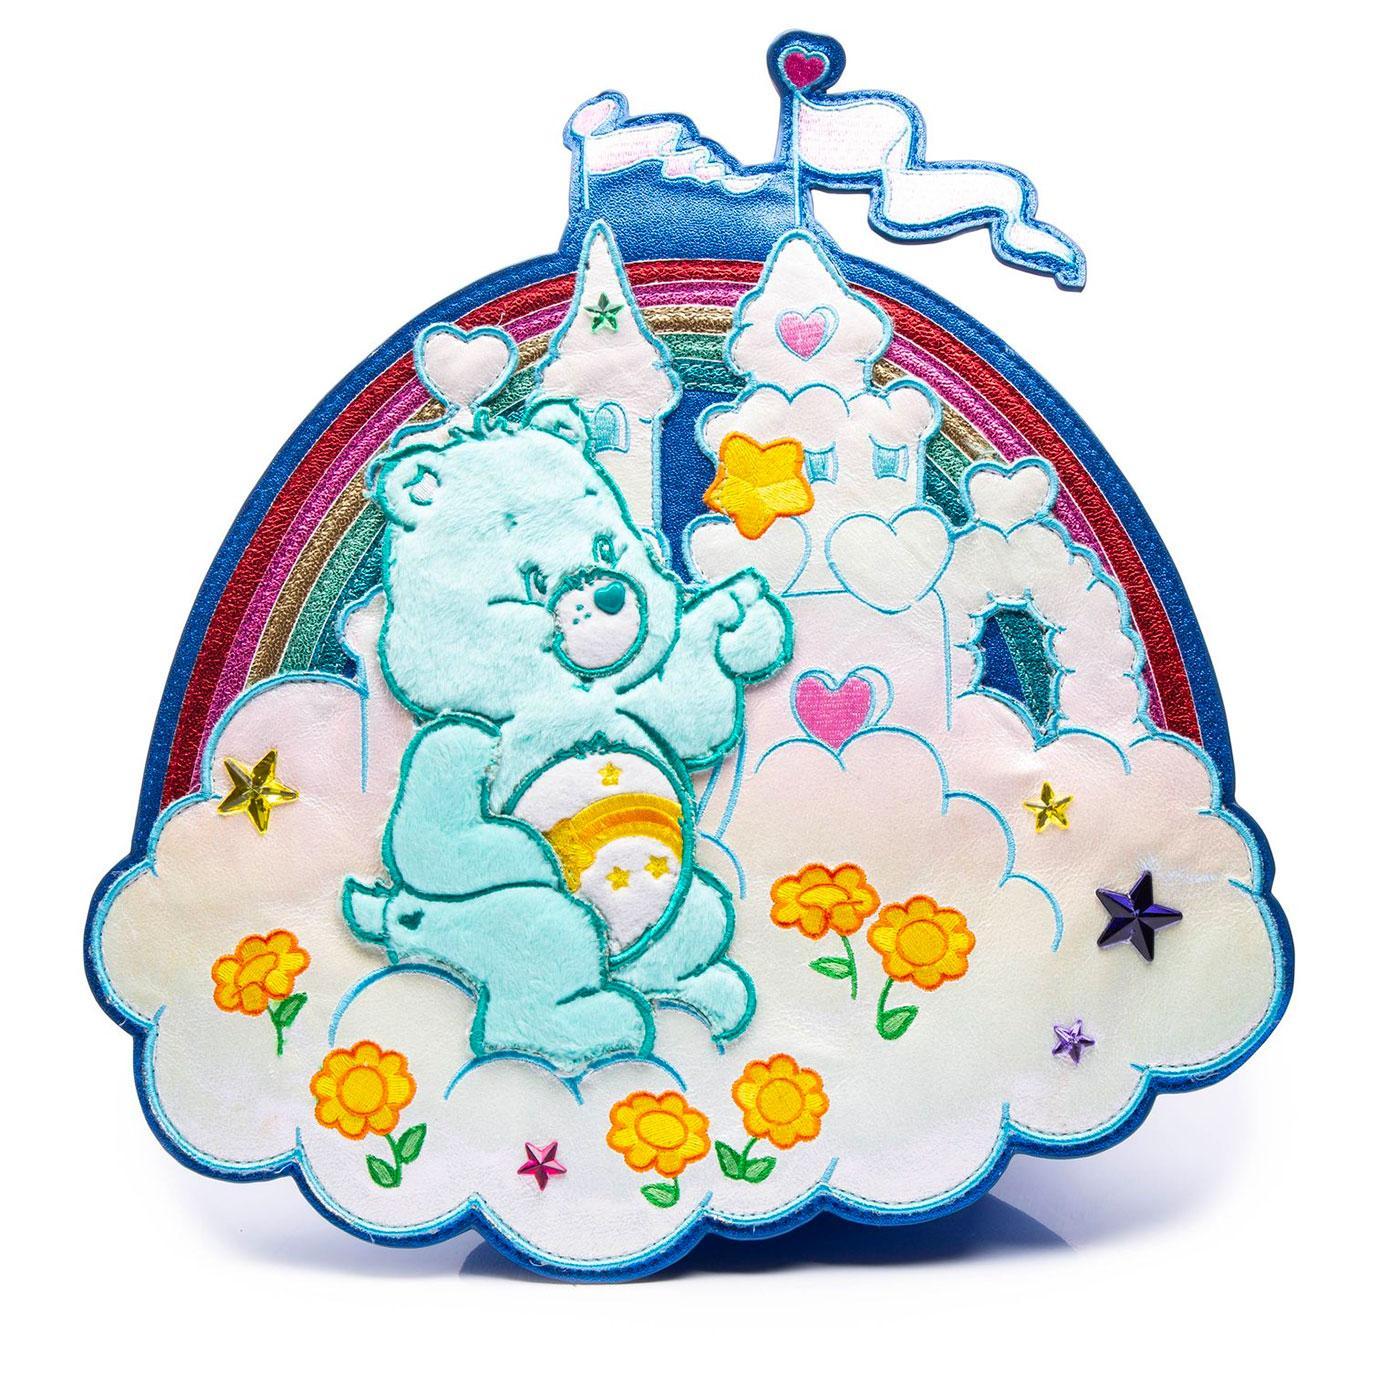 Sweet Wishes IRREGULAR CHOICE Care Bears Handbag